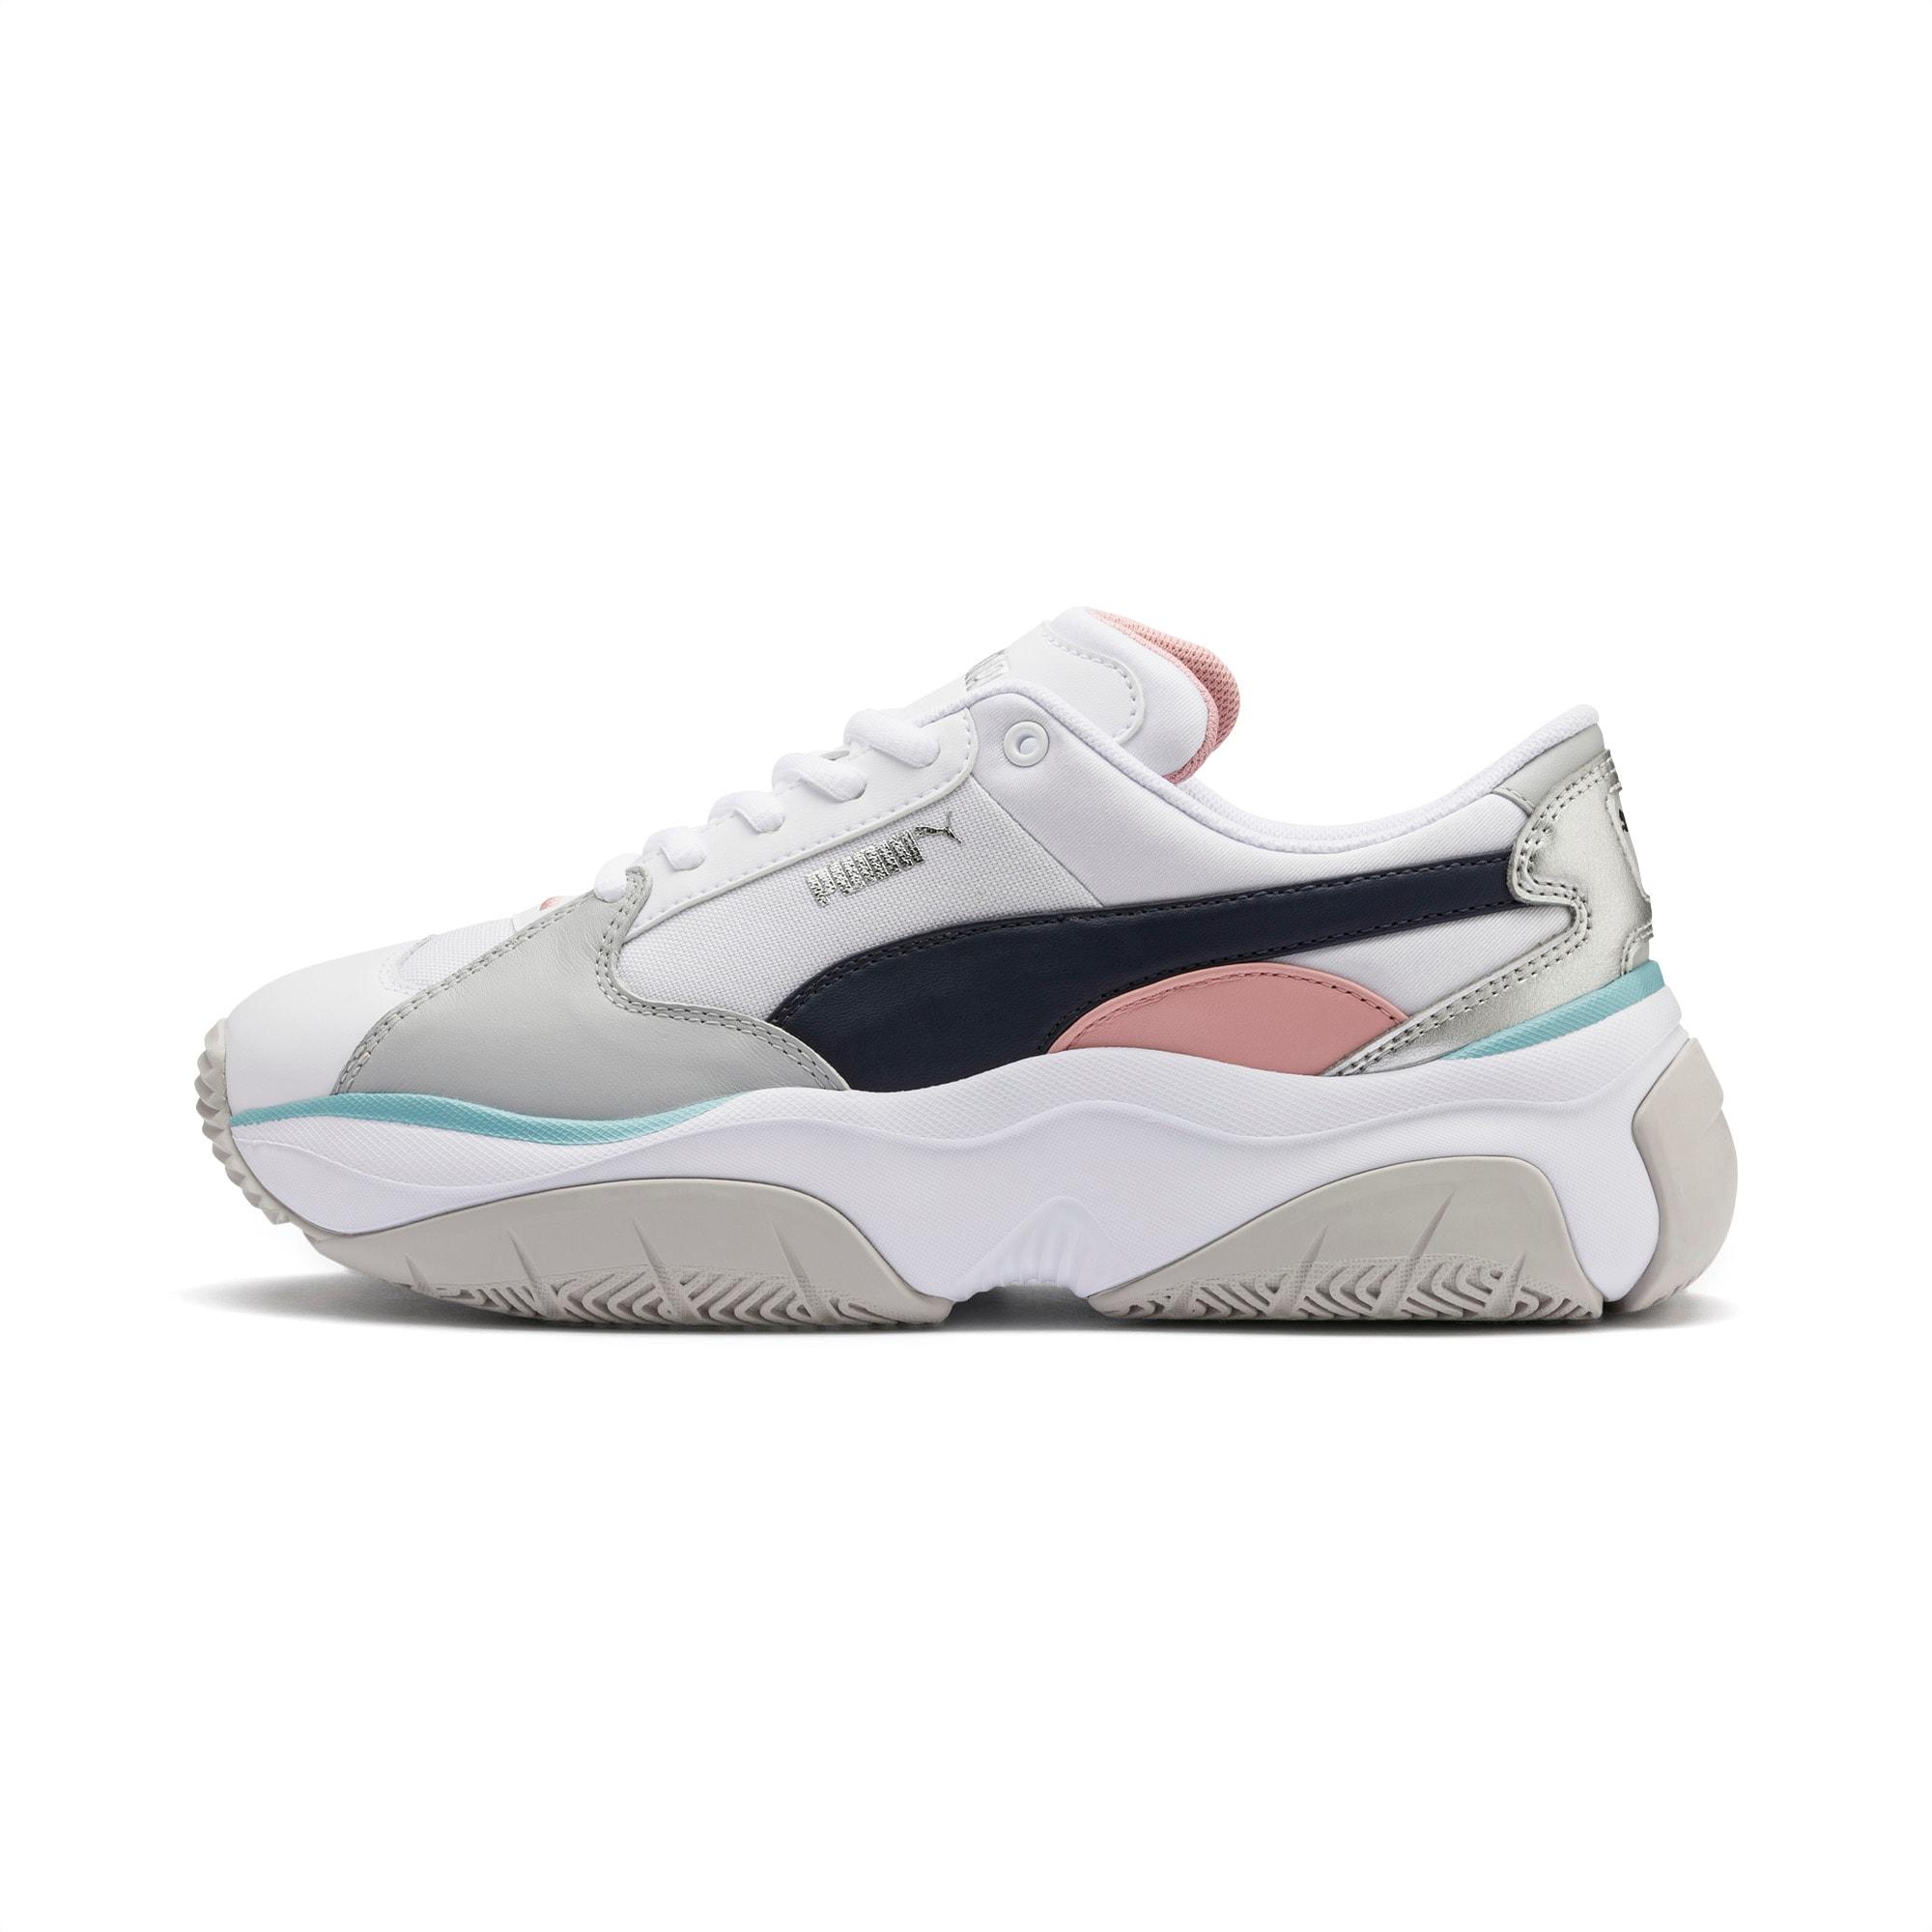 STORM.Y Metallic Wns | Puma, Sneakers og Læder